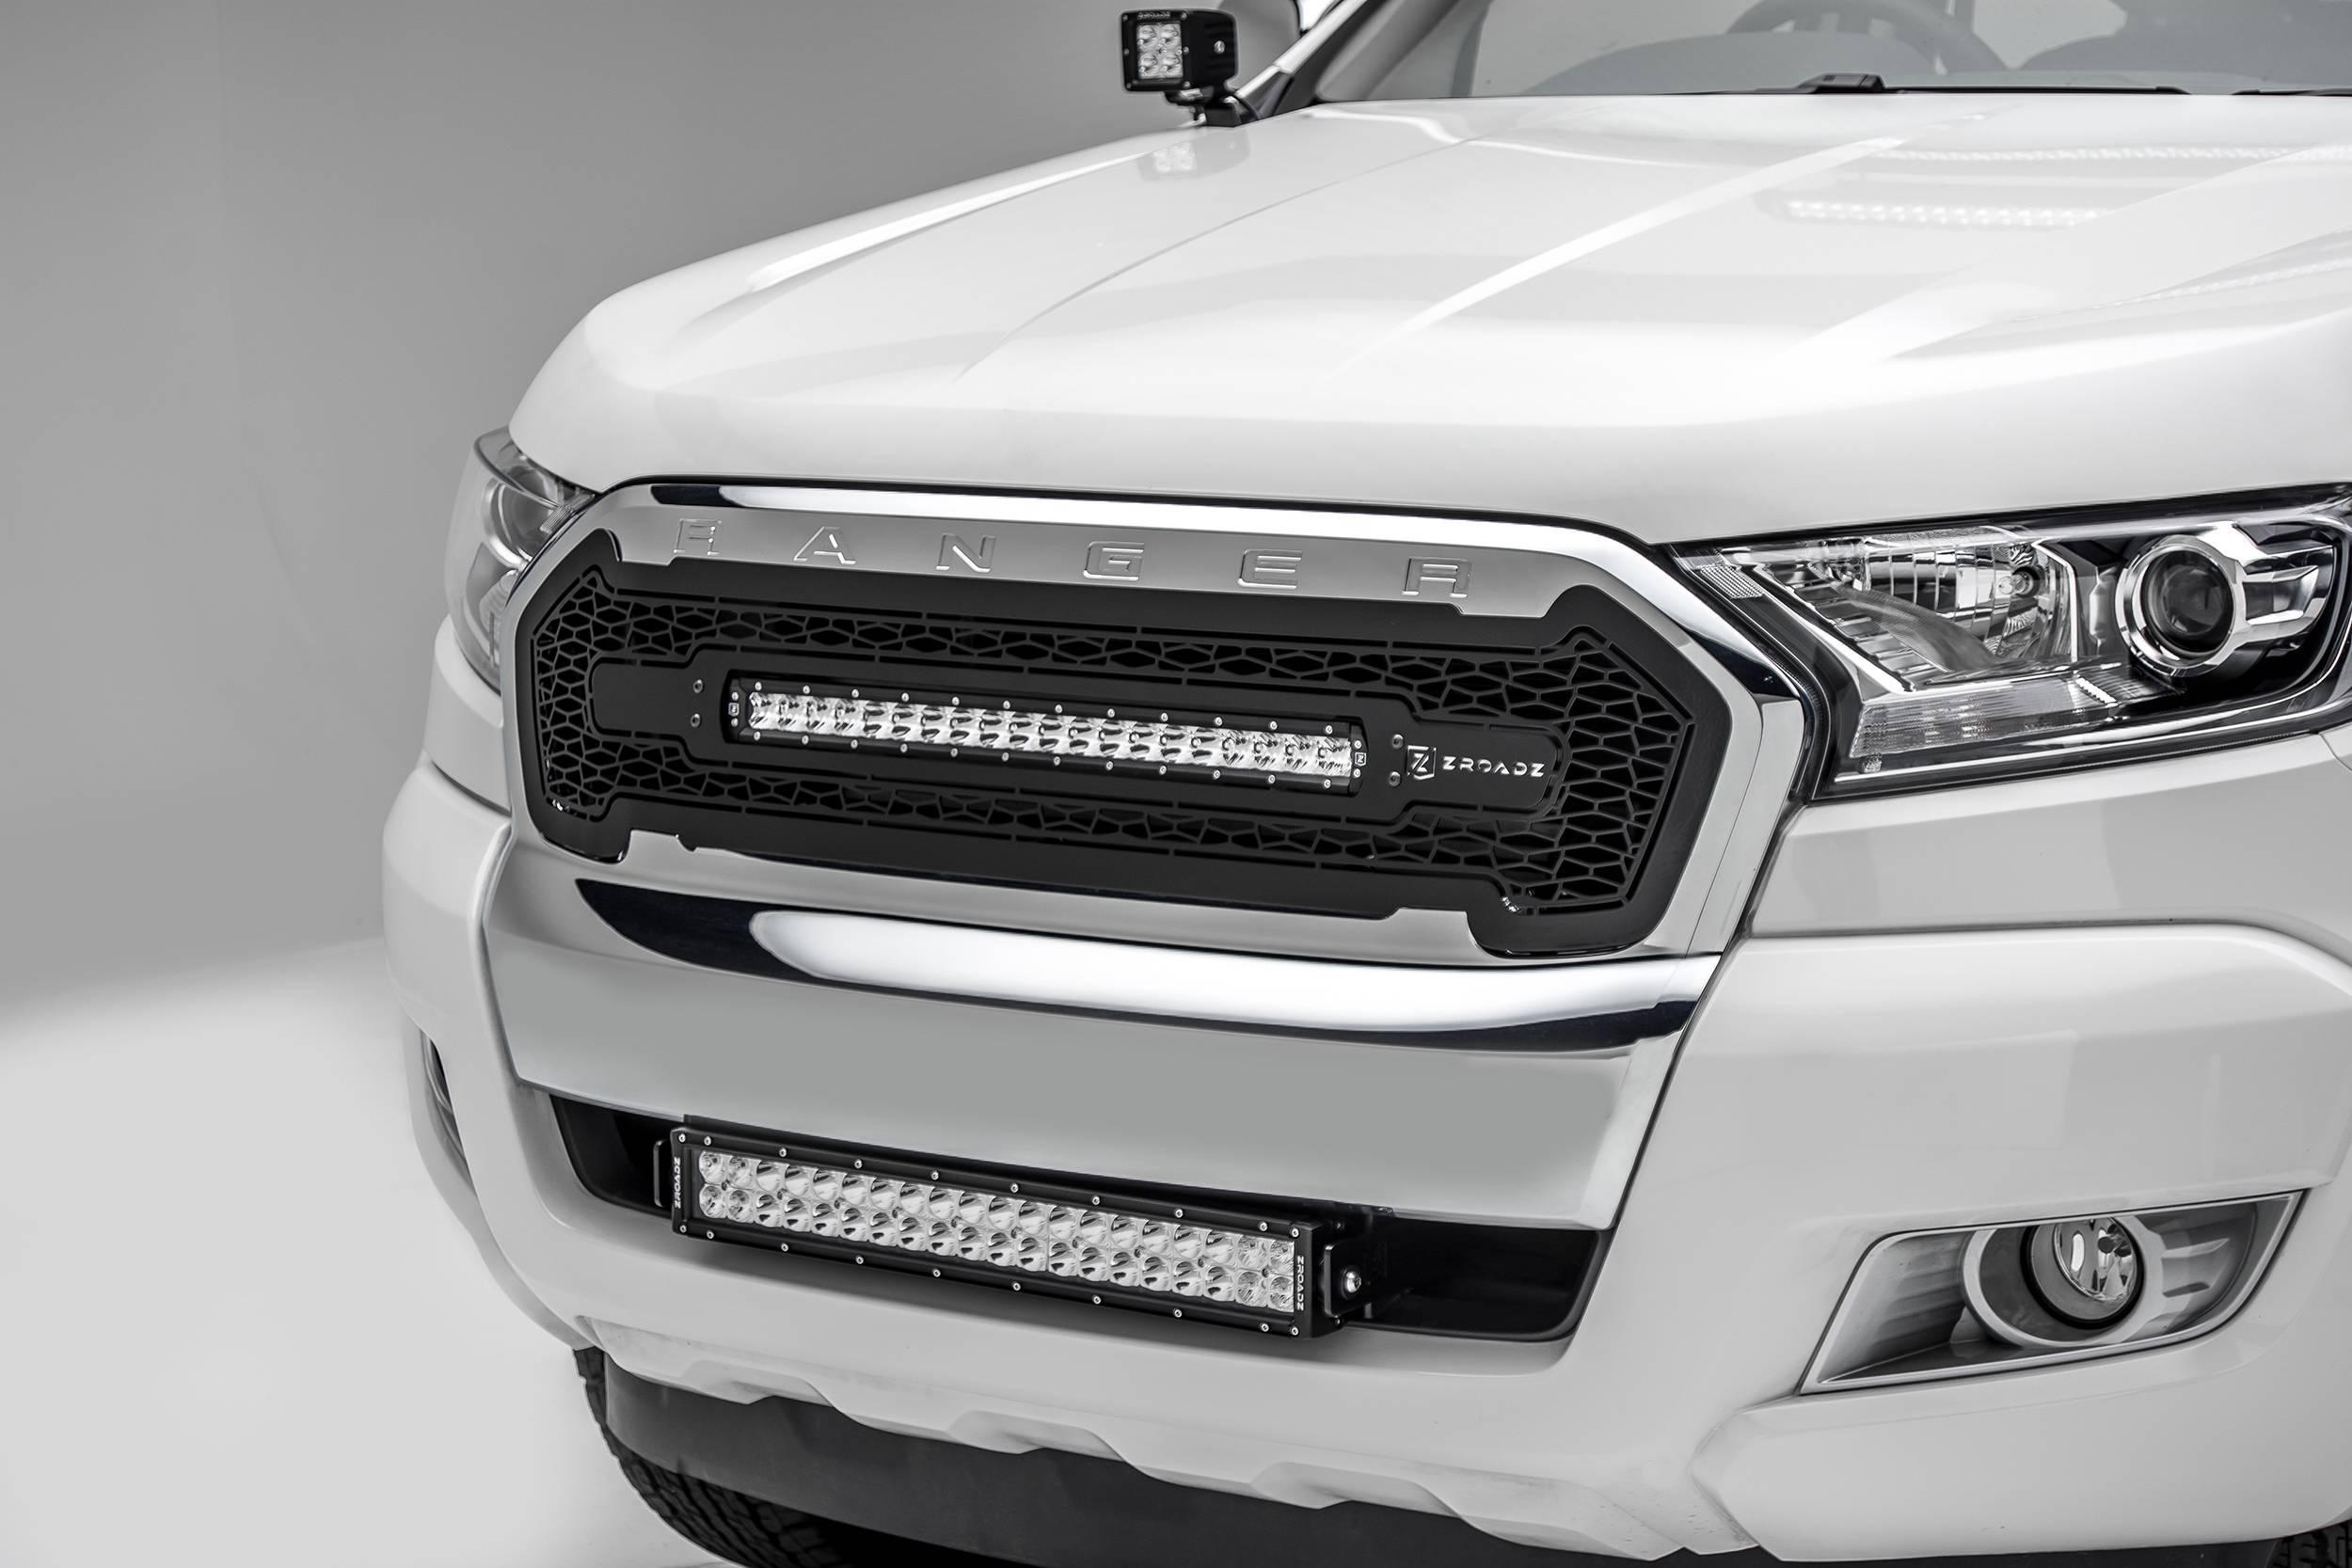 ZROADZ - 2015-2018 Ford Ranger T6 Front Bumper Center LED Kit with (1) 20 Inch LED Straight Double Row Light Bar - PN #Z325761-KIT